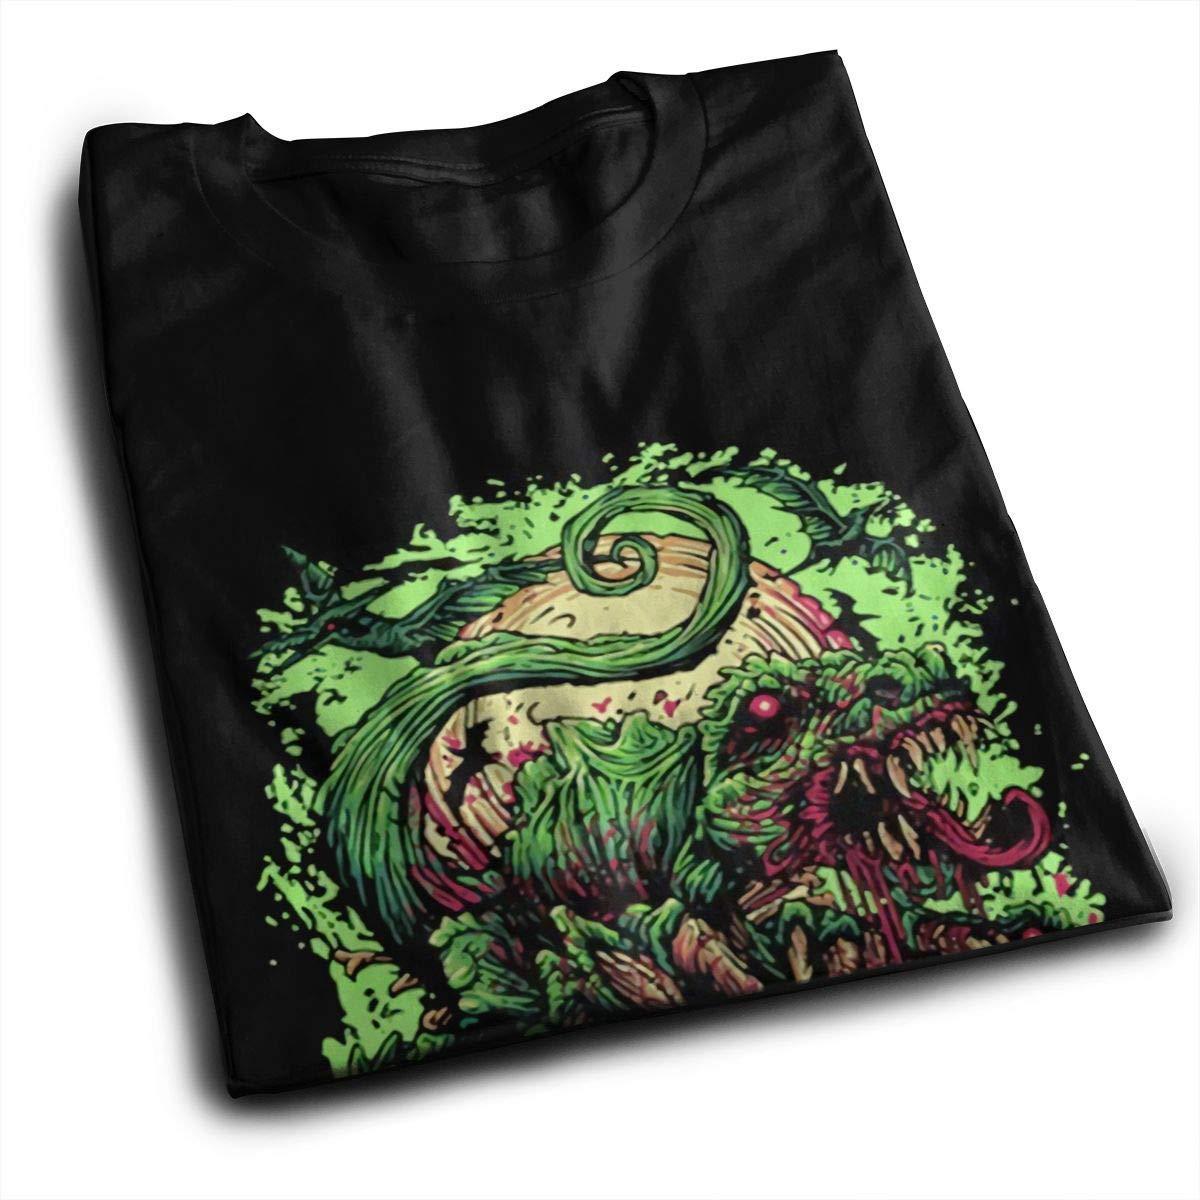 K-deio Men Bring Me The Horizon Dinosaur Cotton Shirt Black